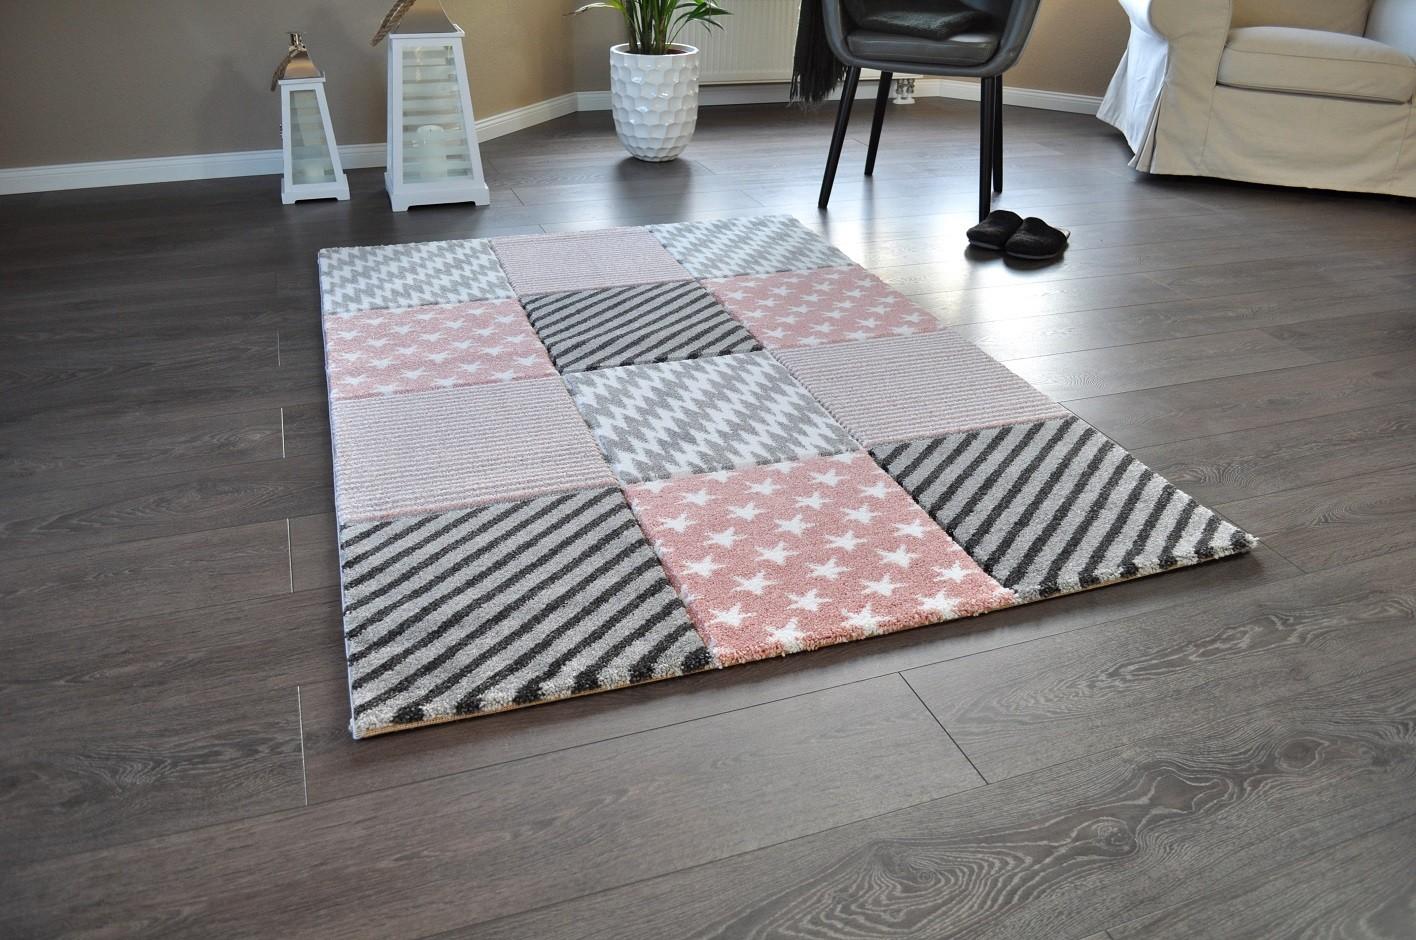 hochwertiger design teppich relief tf 19 rosa grau wei sterne 120 x 170 teppiche design trend. Black Bedroom Furniture Sets. Home Design Ideas